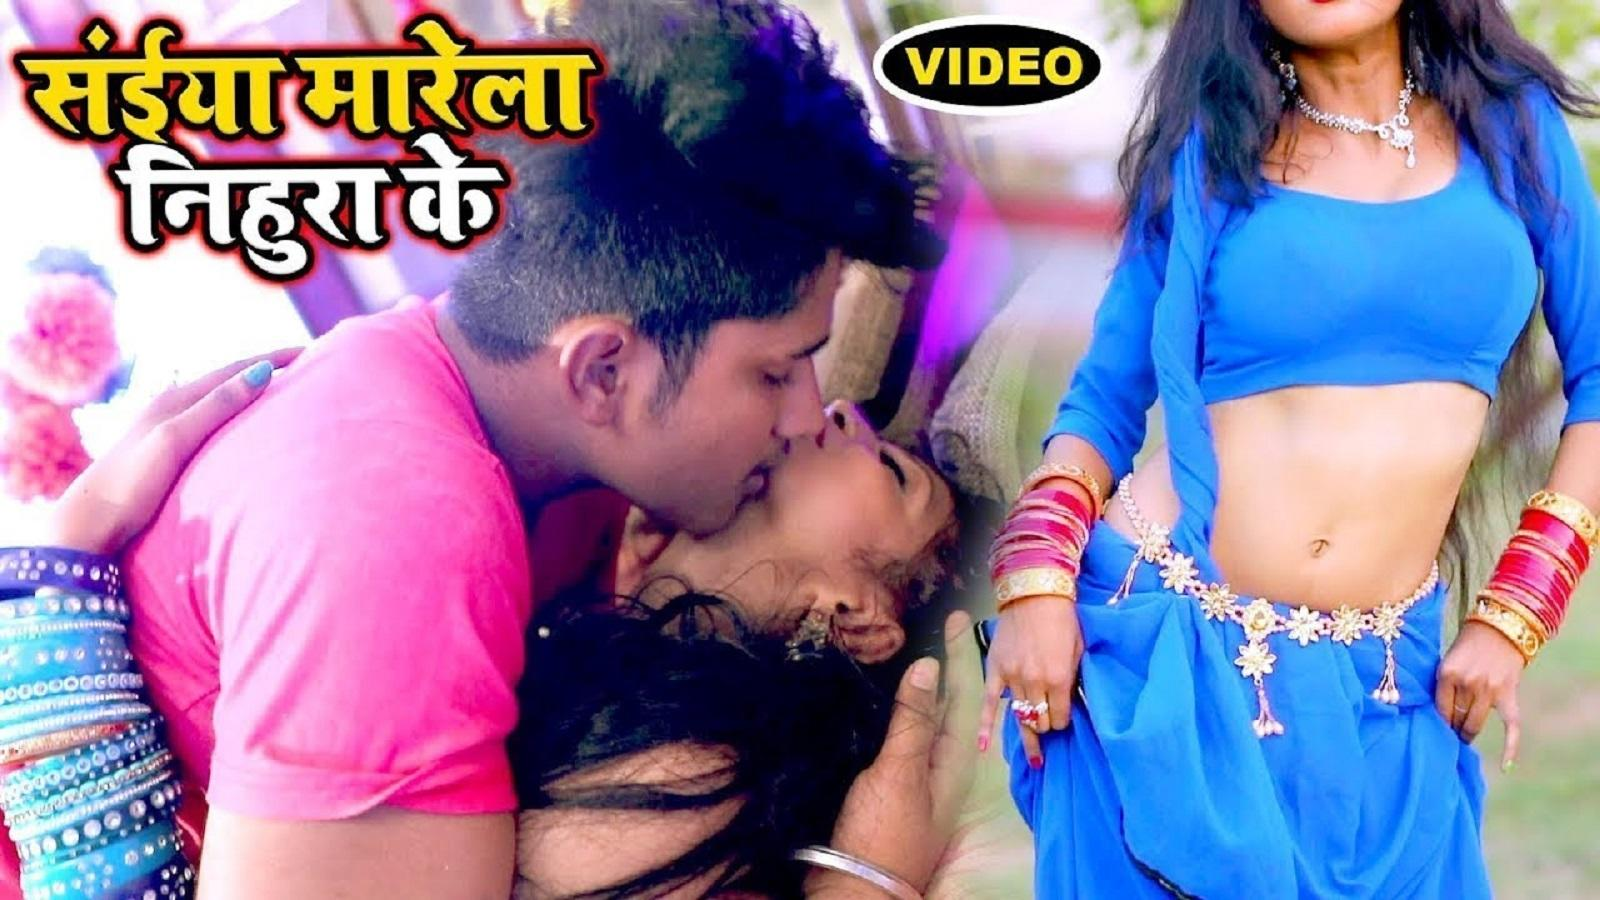 Latest Bhojpuri song 'Saiya Maare Jahiya Machhari Khiyawela Jarur' sung by  Rahul Ranjan | Bhojpuri Video Songs - Times of India